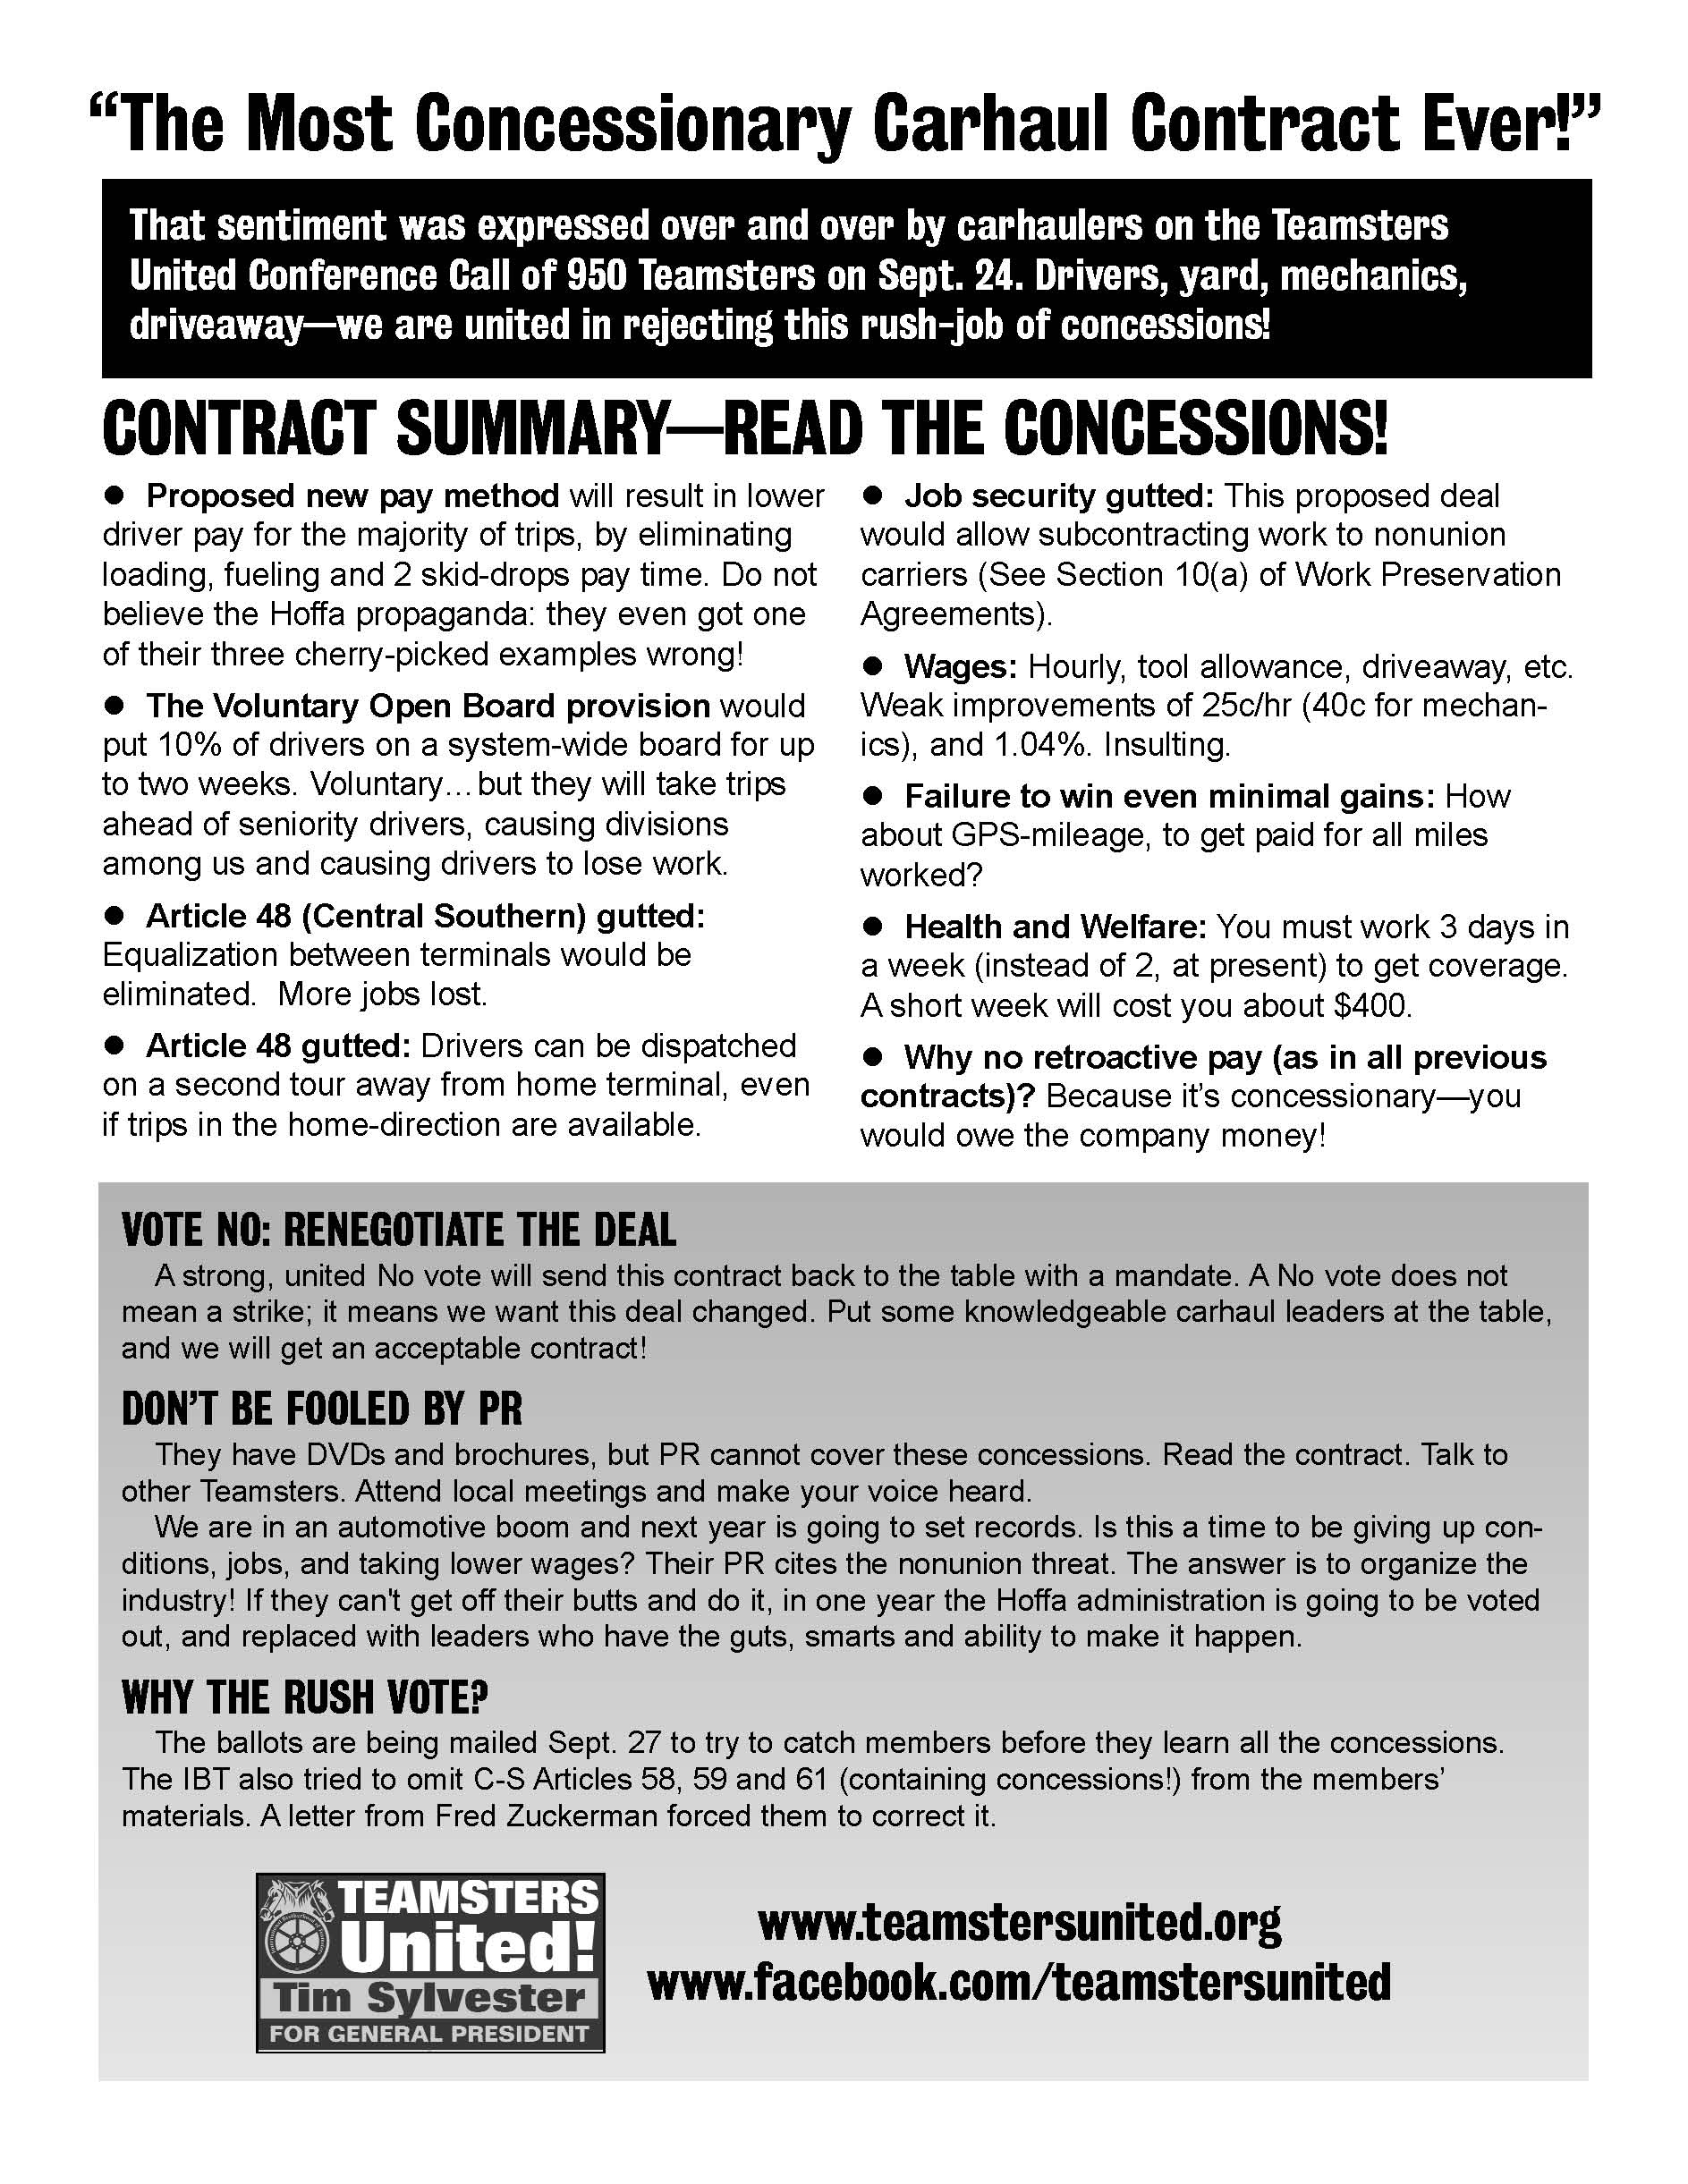 Carhaul-contract_updated.jpg